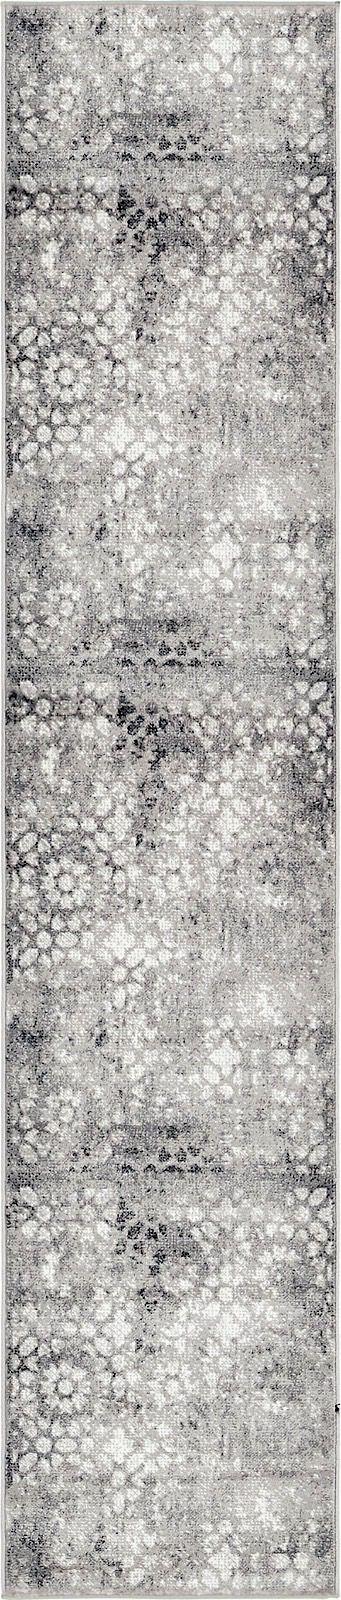 rugpal sandrine transitional area rug collection